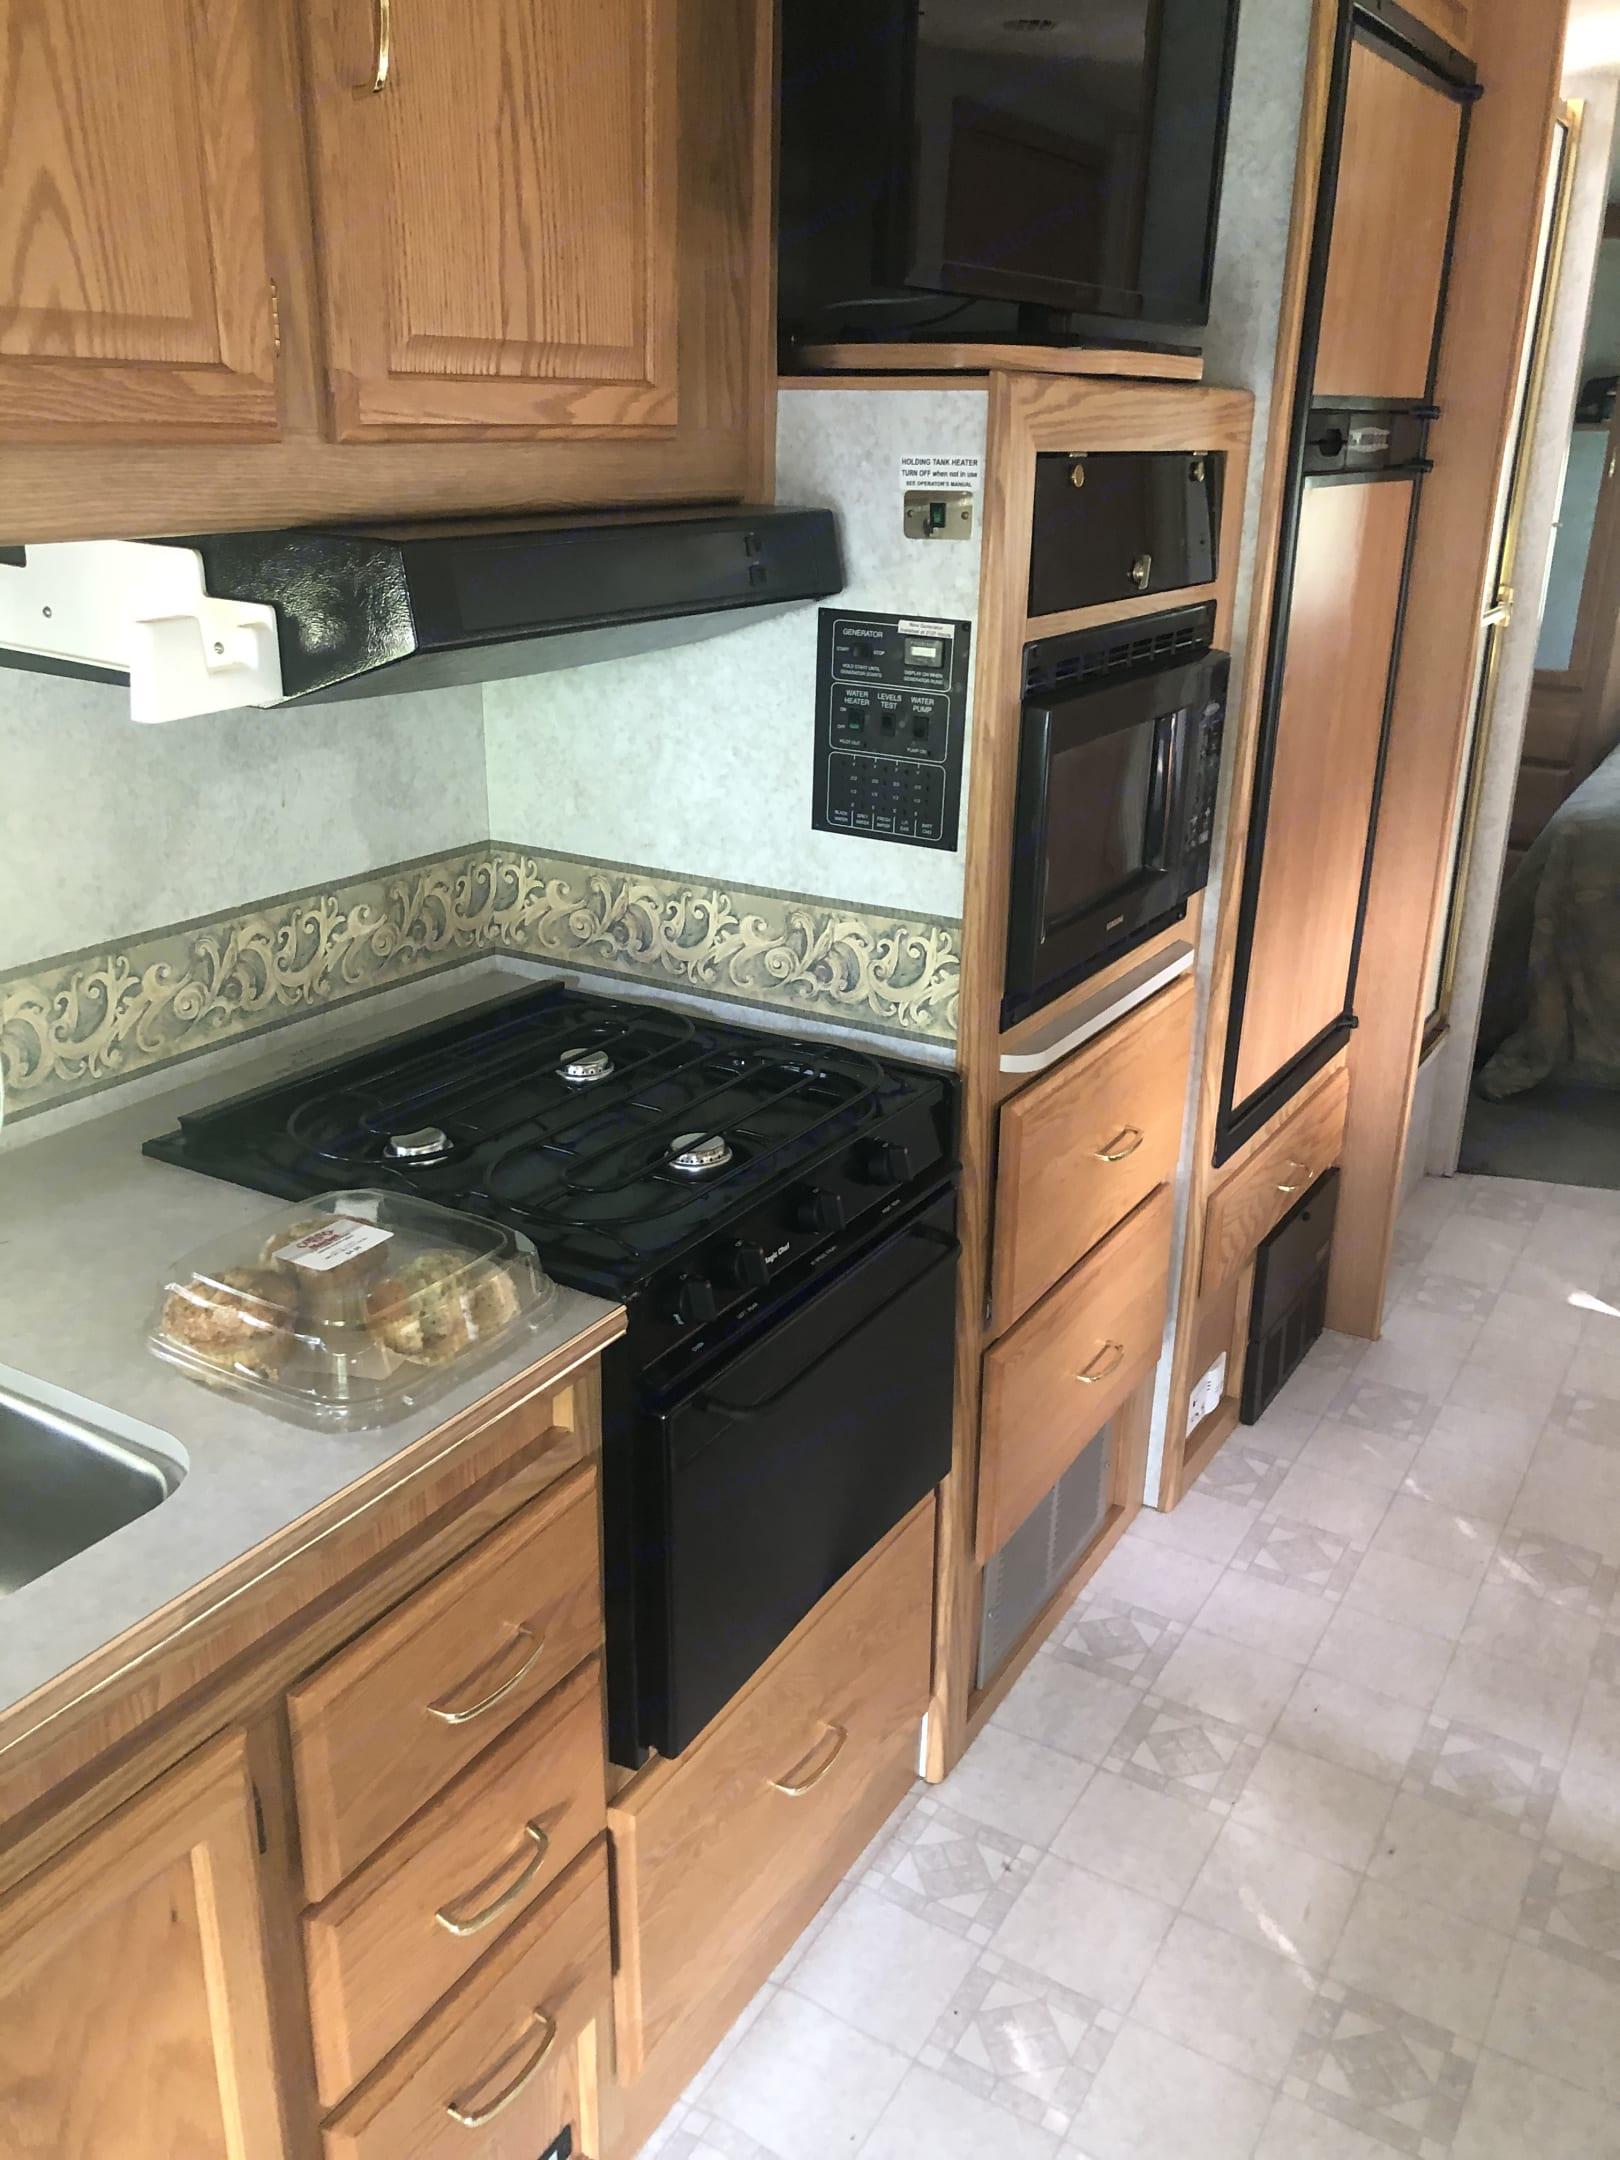 Kitchen with fridge stove micro. Winnebago Minnie Winnie 2002